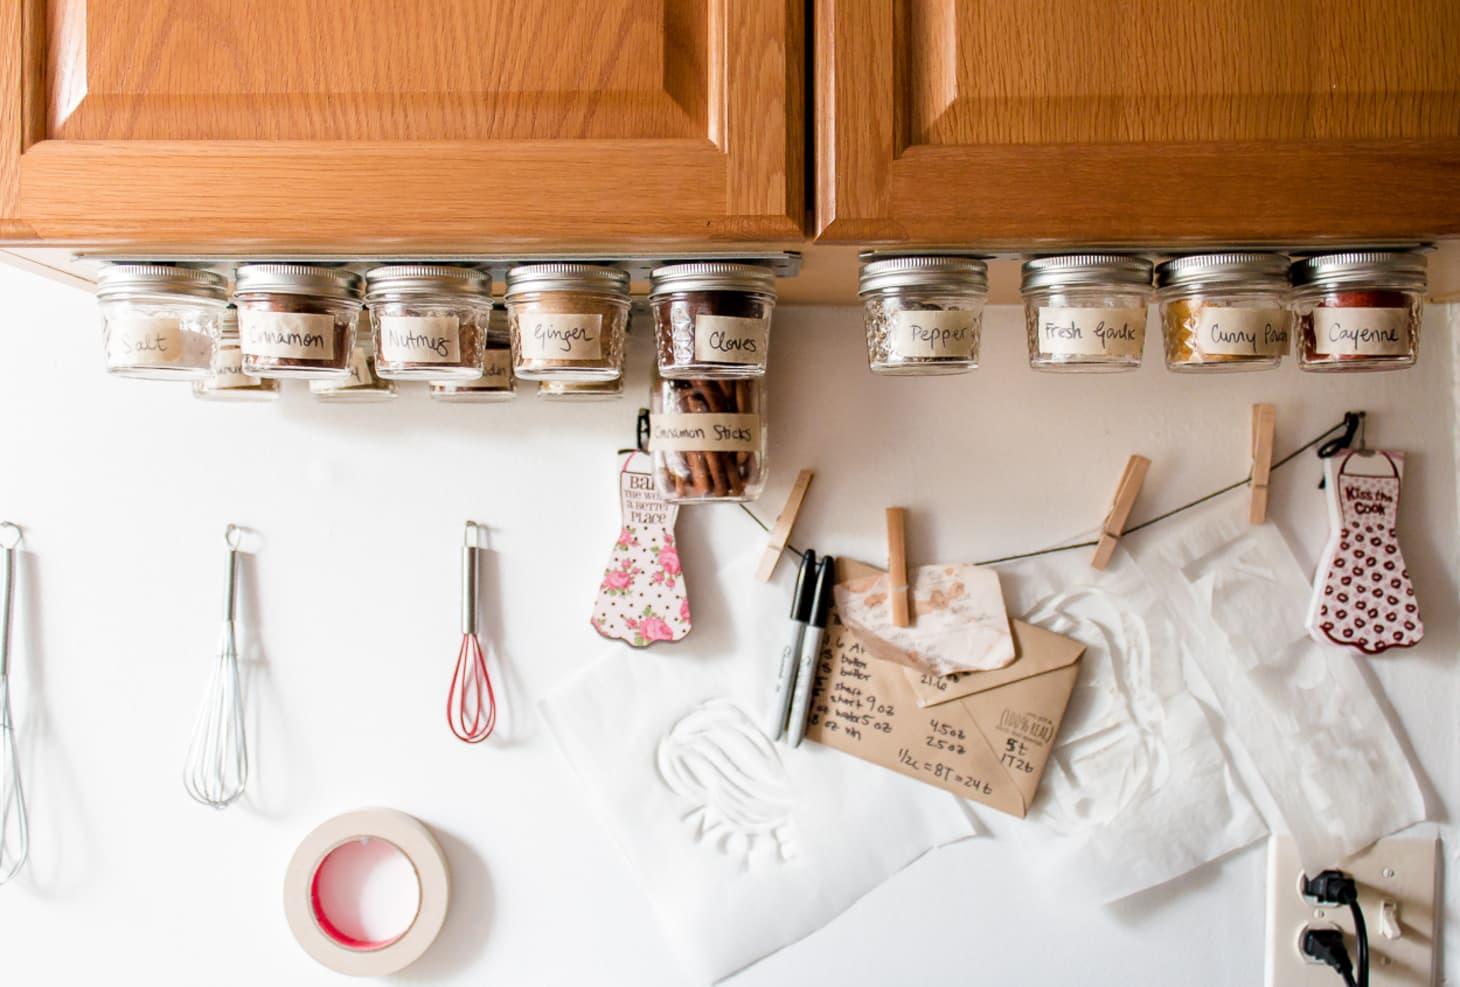 Storage Ideas for Small Kitchens | Kitchn - photo#44